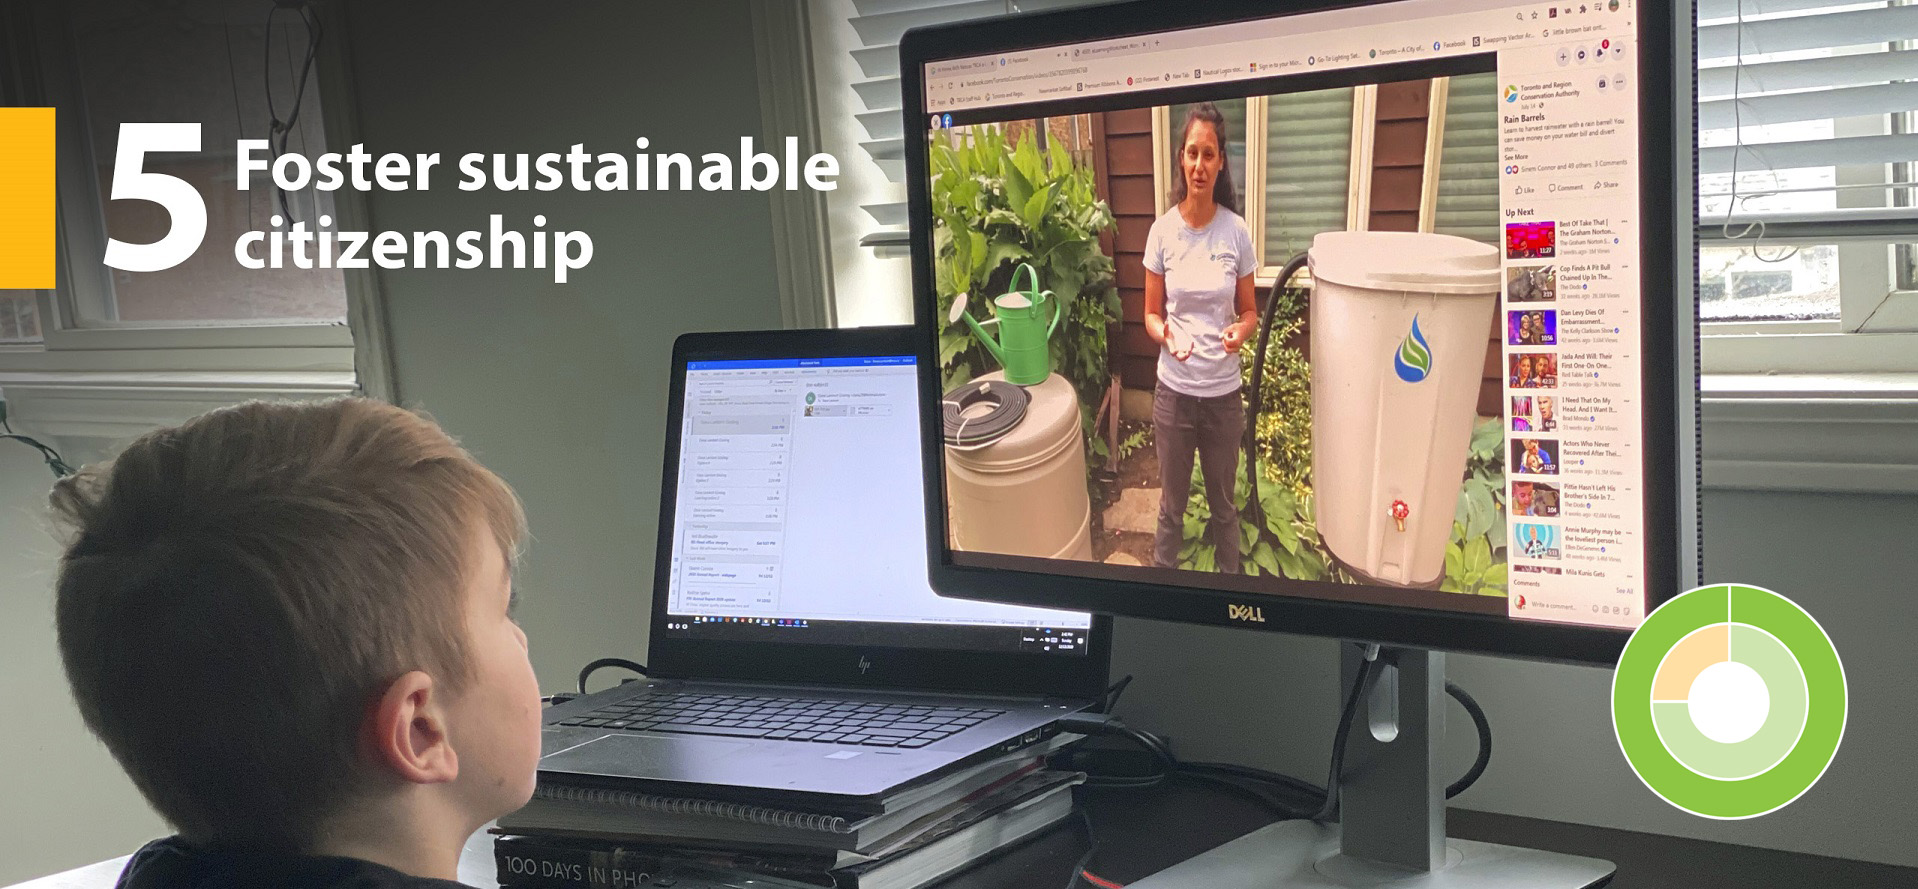 TRCA Strategic Goal 5 Foster Sustainable Citizenship